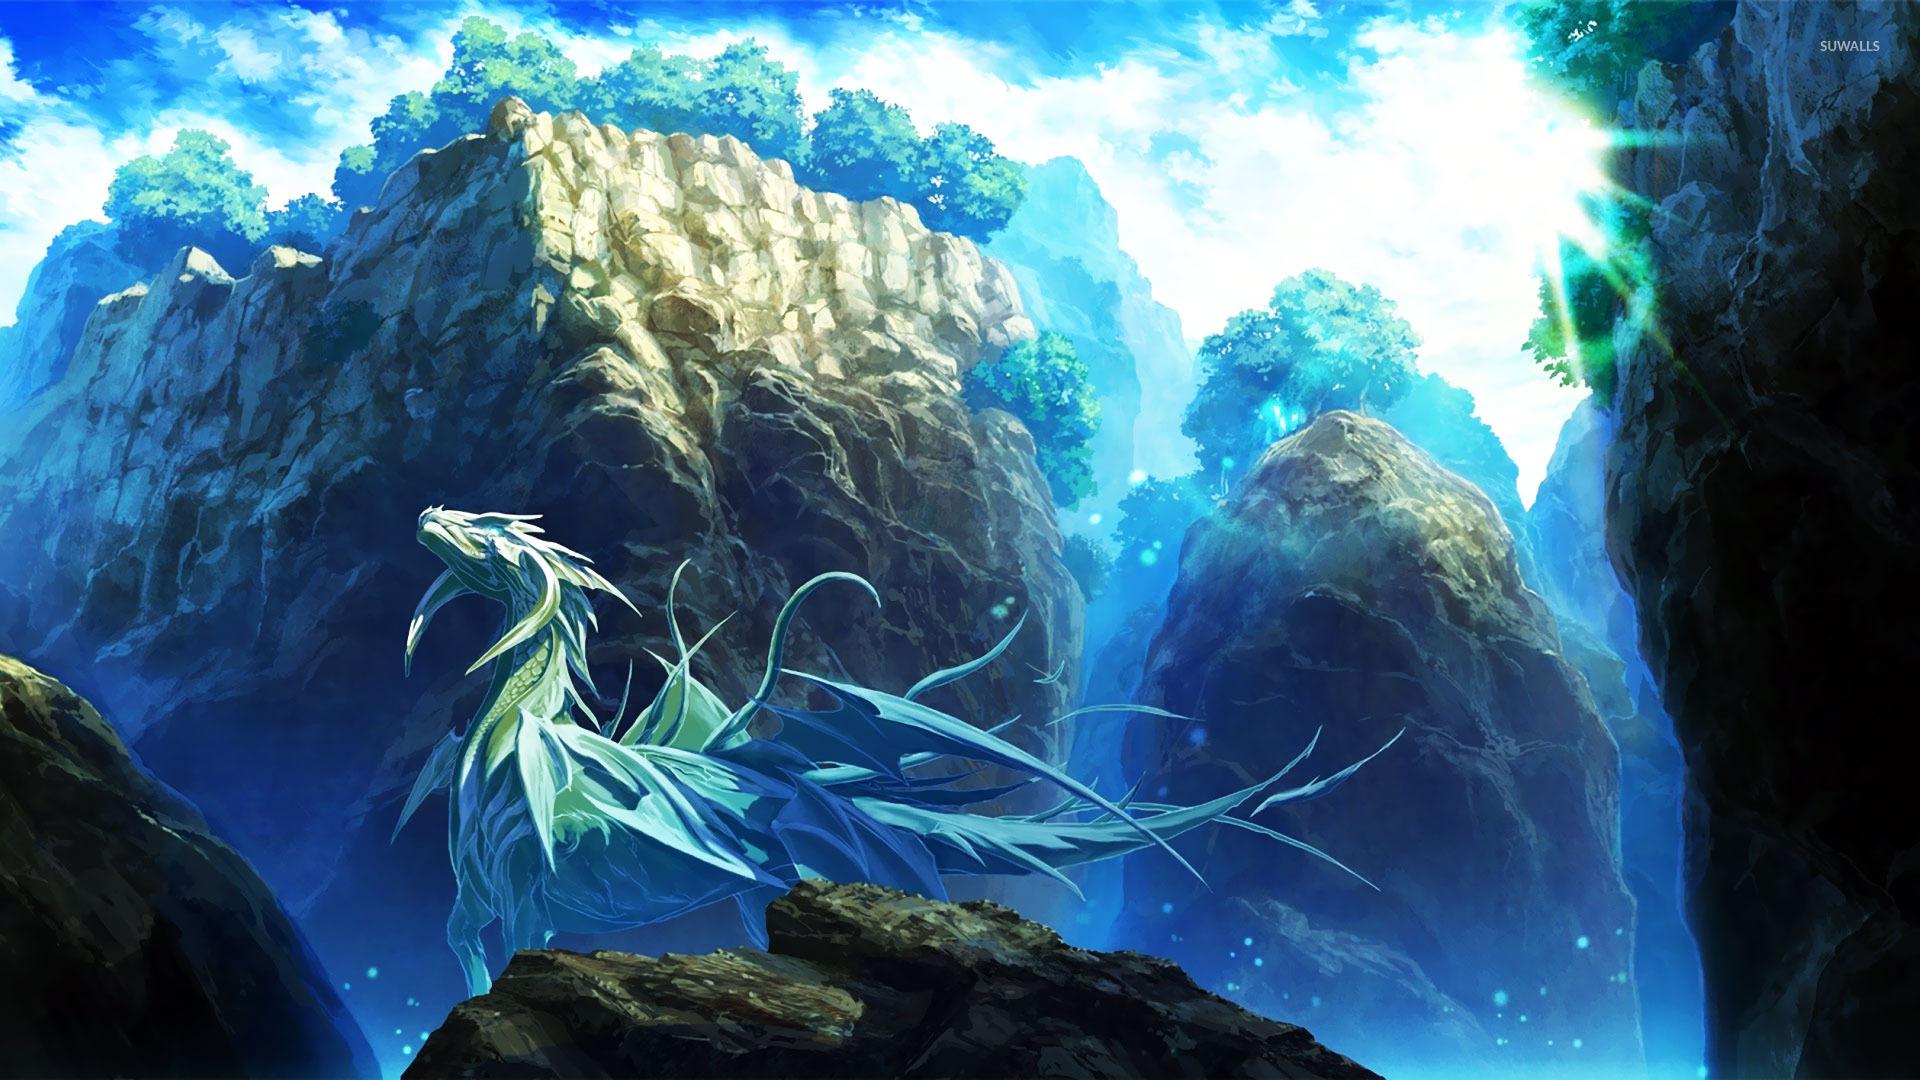 Ice dragon wallpaper   Fantasy wallpapers   18598 1280x800